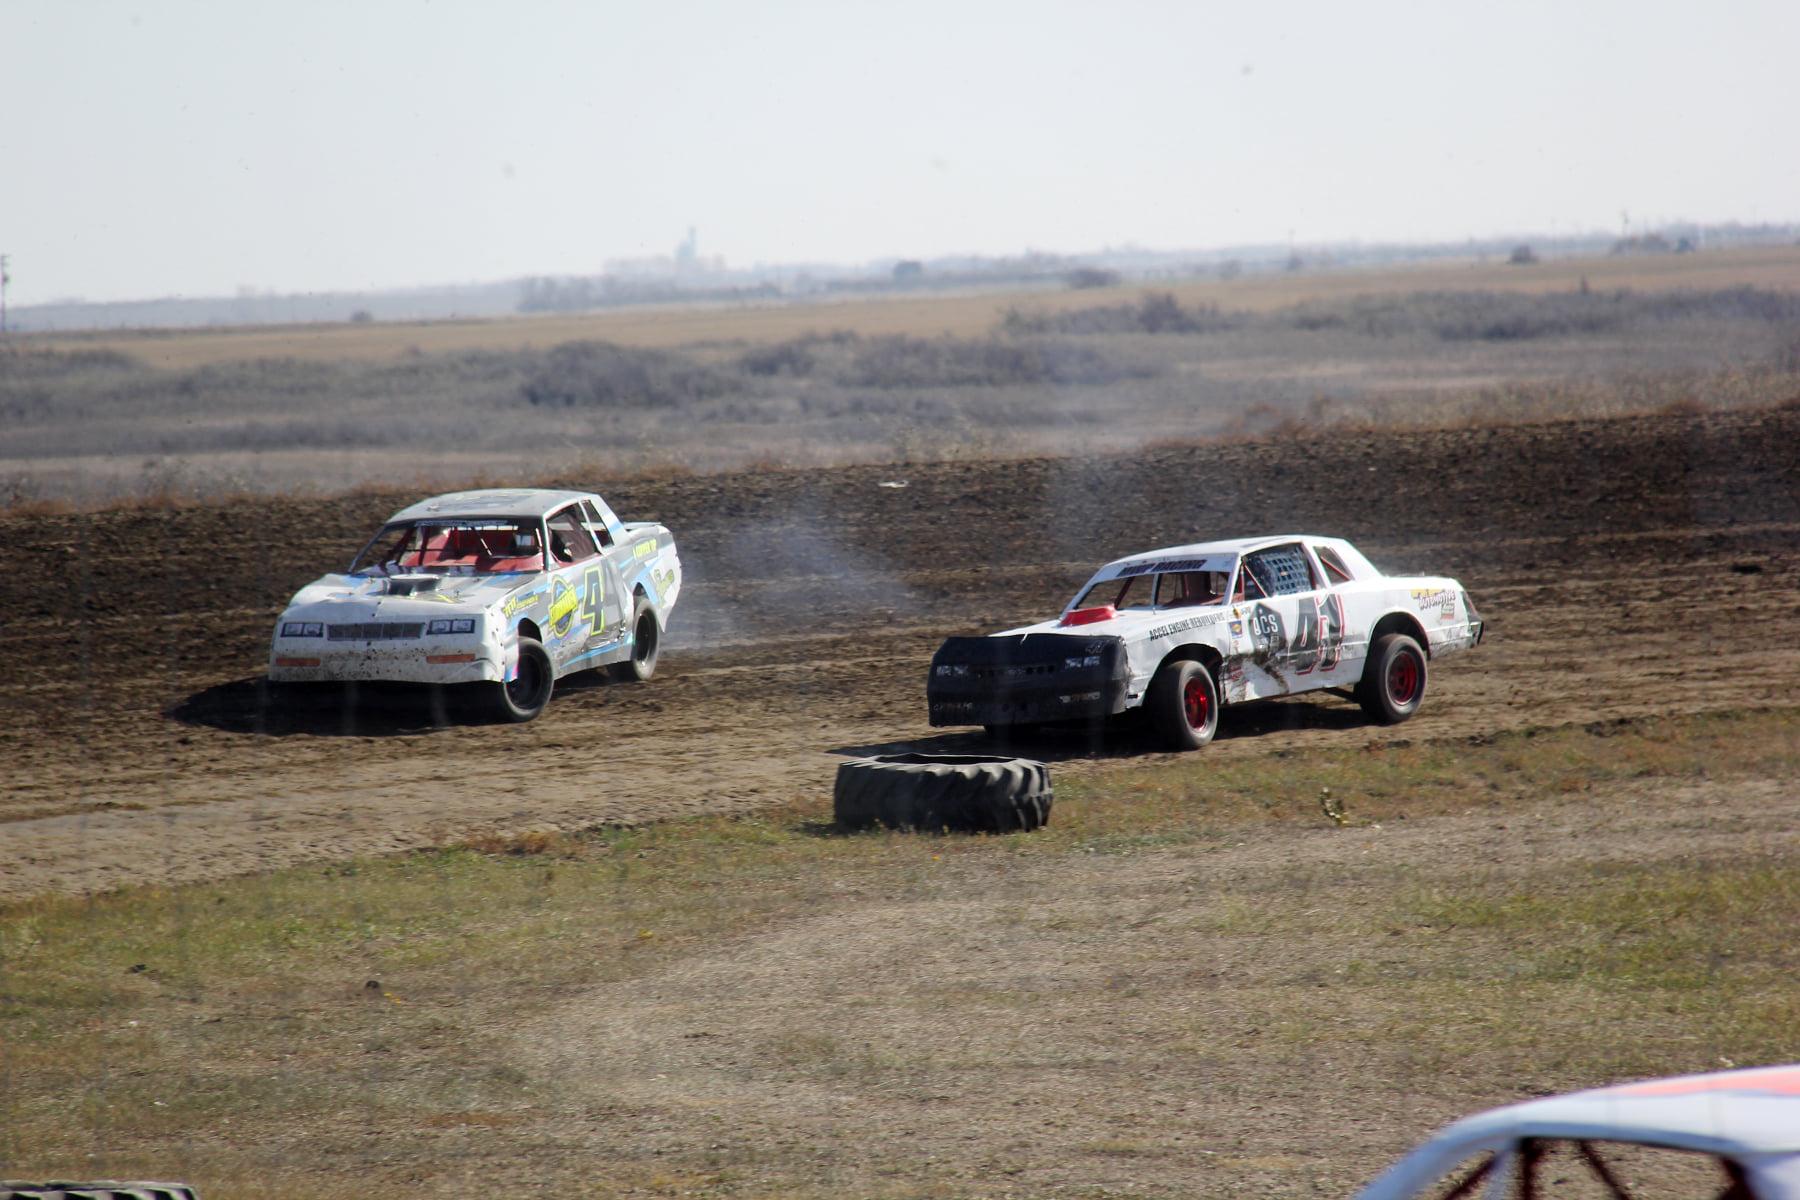 Outlook_Racing_Kemmer_Racing_Photography_9.jpg